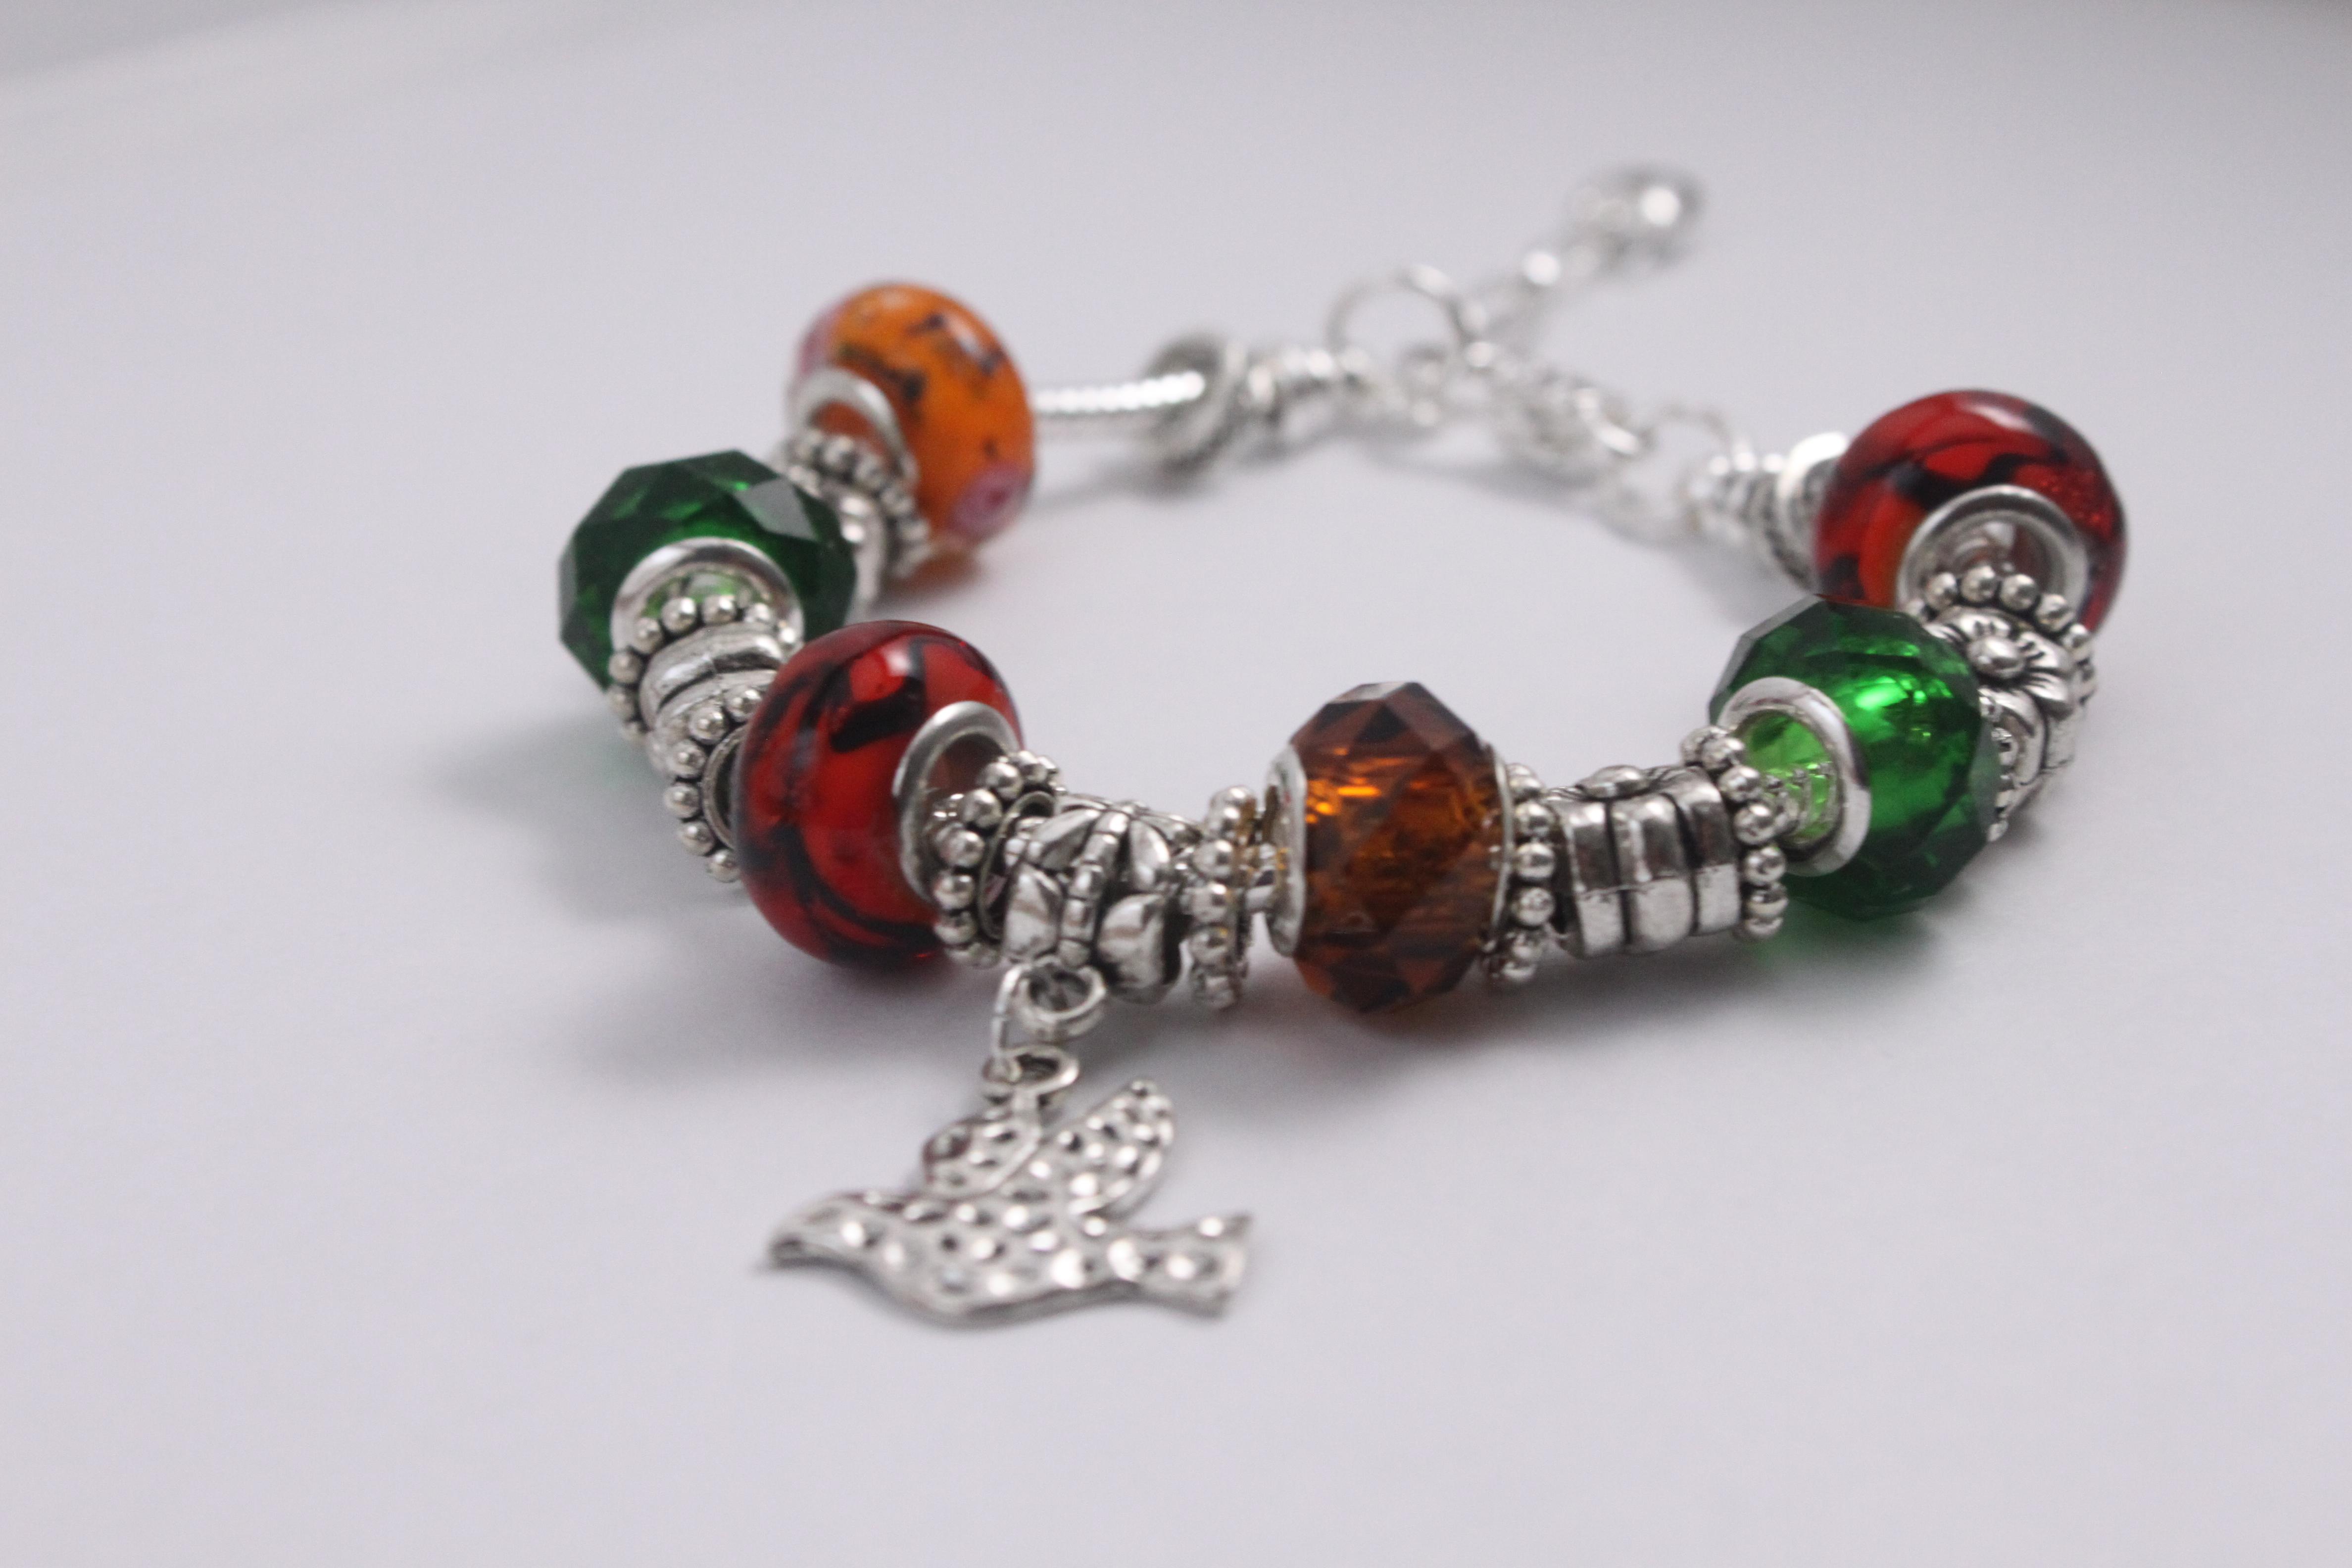 Bird charm bracelet - red green